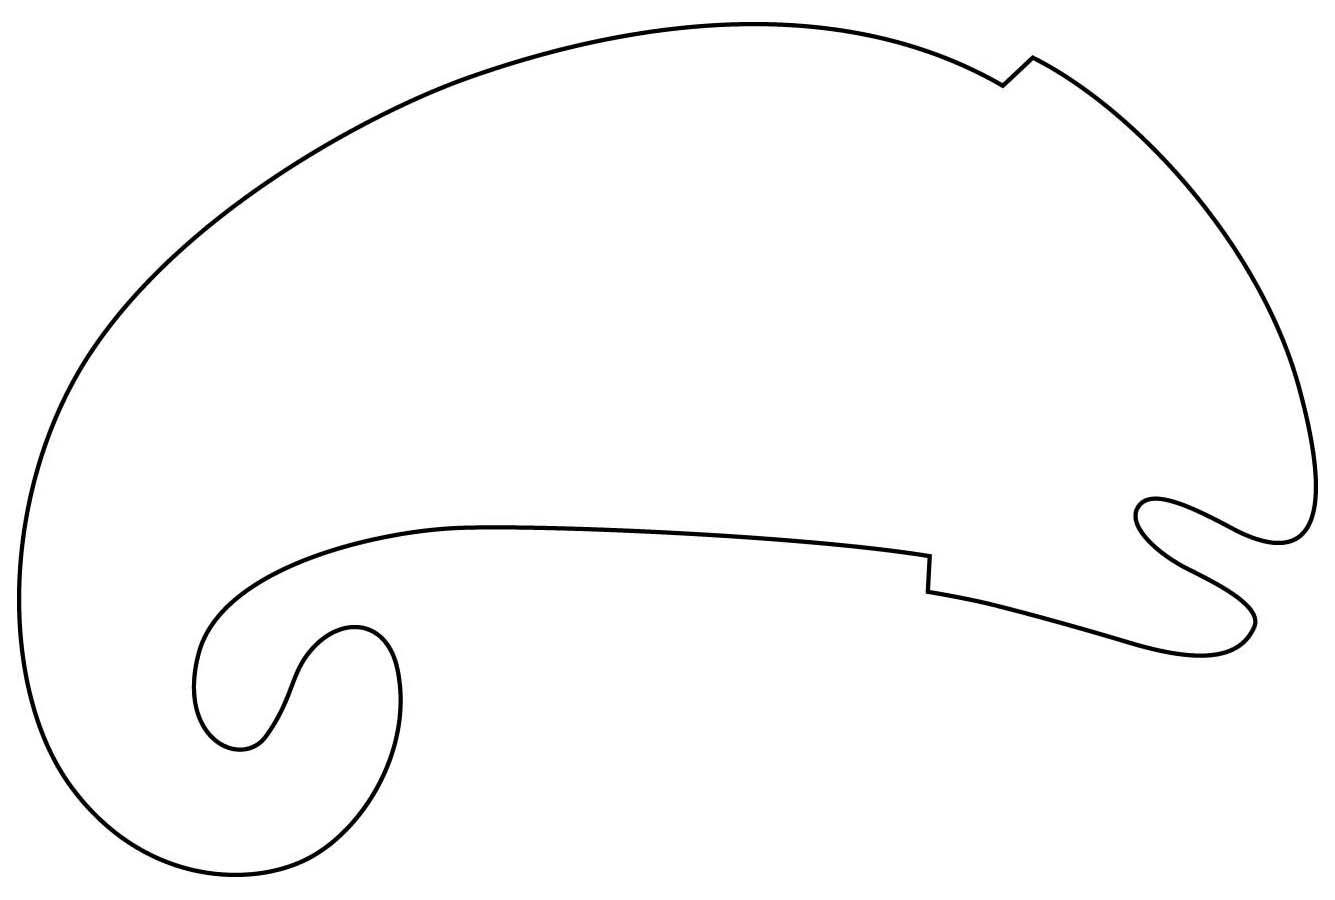 Chameleon Template For Eric Carle Or Leo Lionni Make Feet